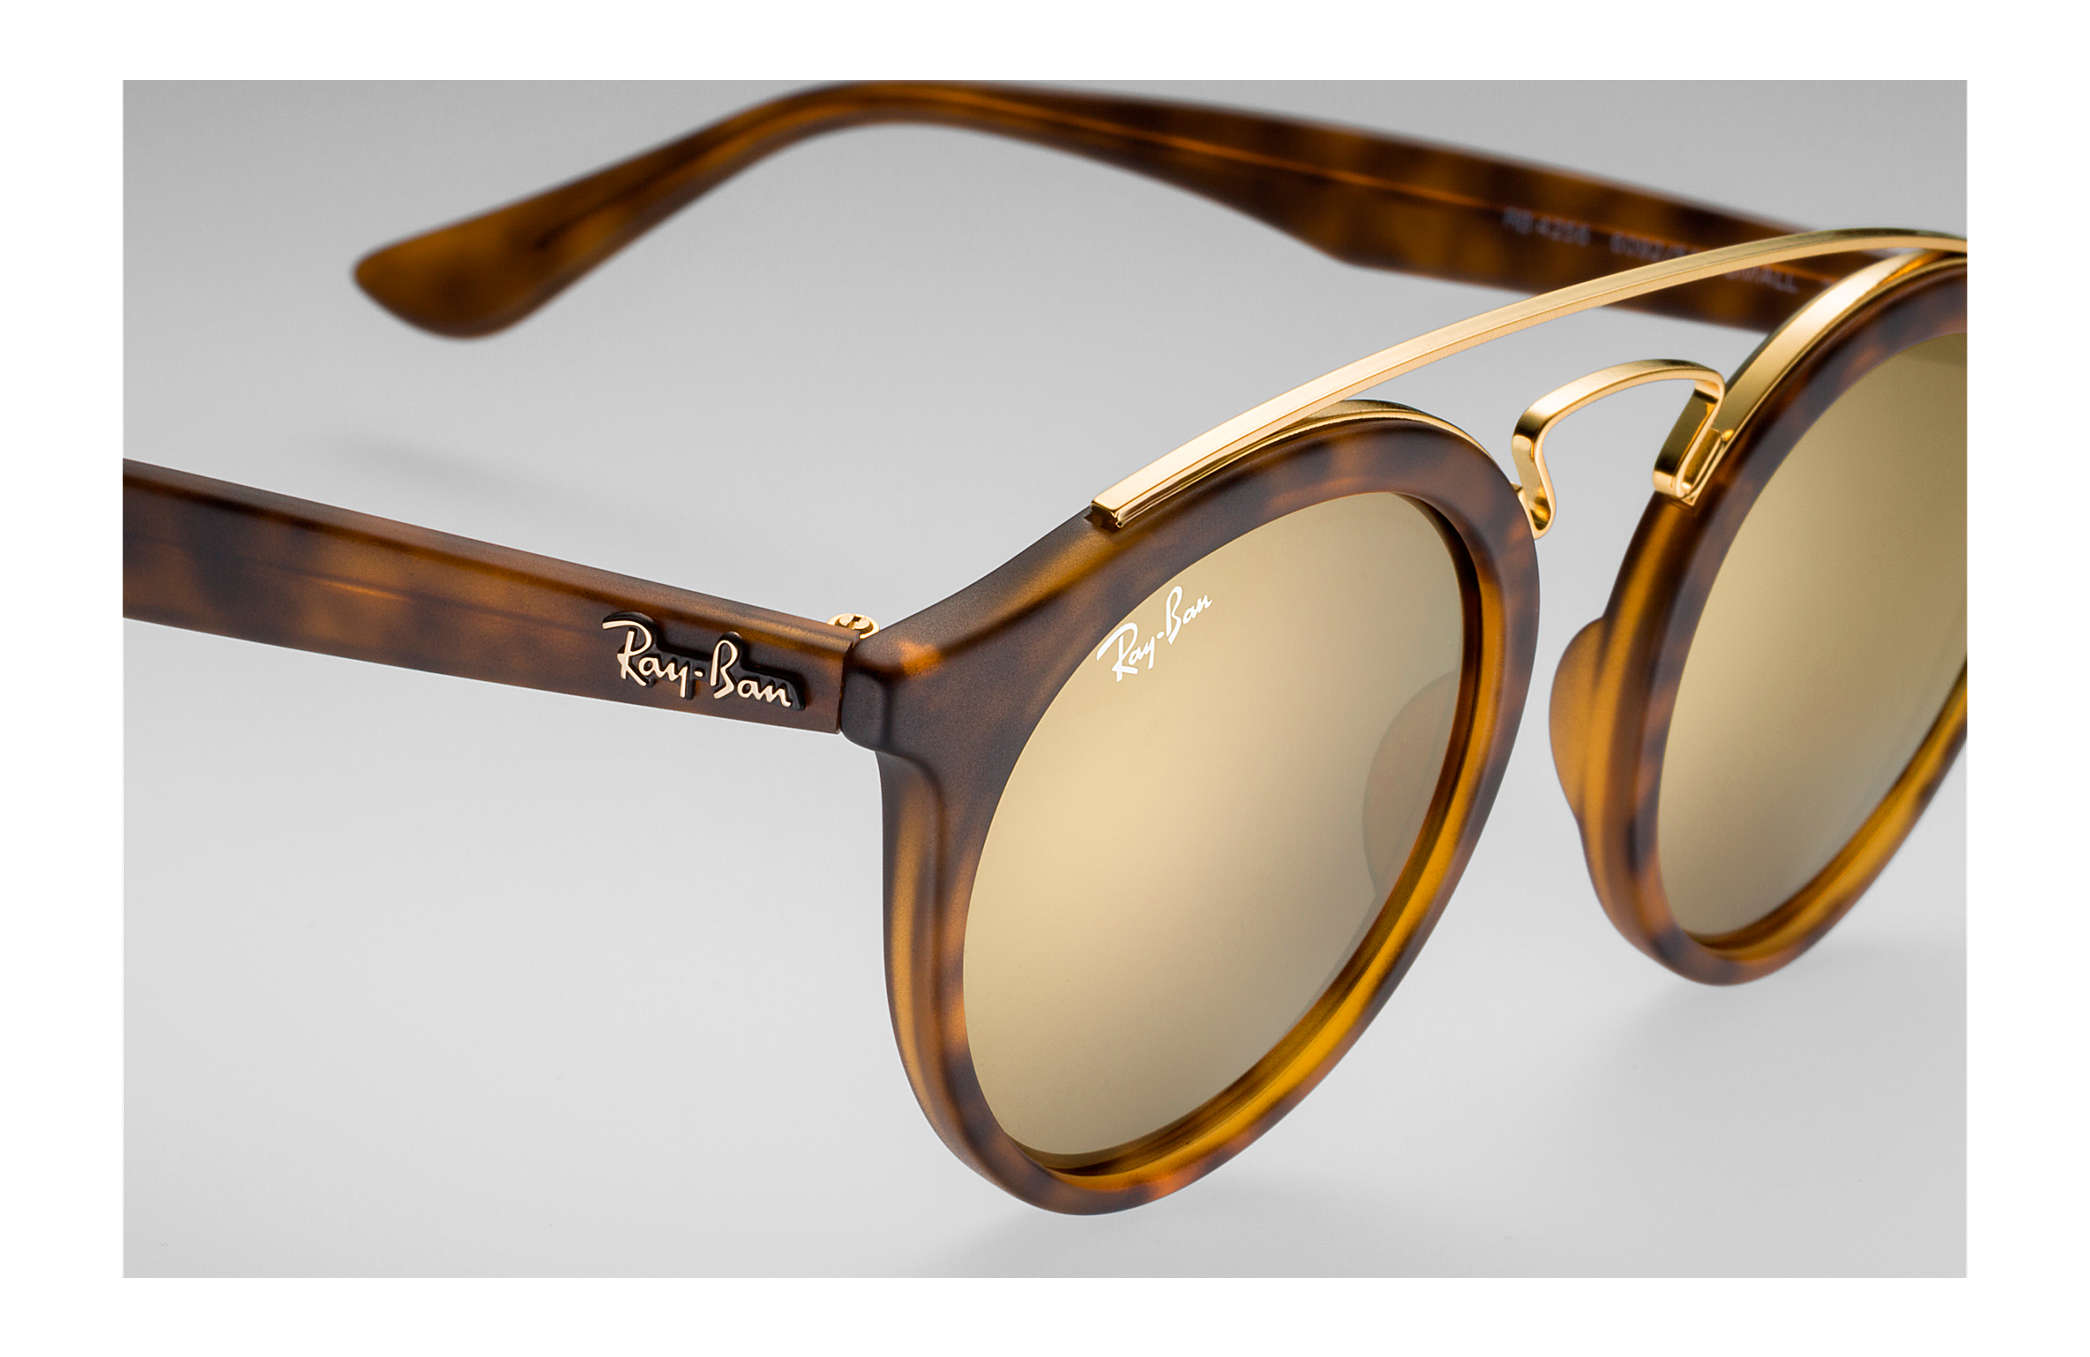 44616e2f0c Ray-Ban Rb4256 Gatsby I RB4256 Tortoise - Propionate - Gold Lenses ...